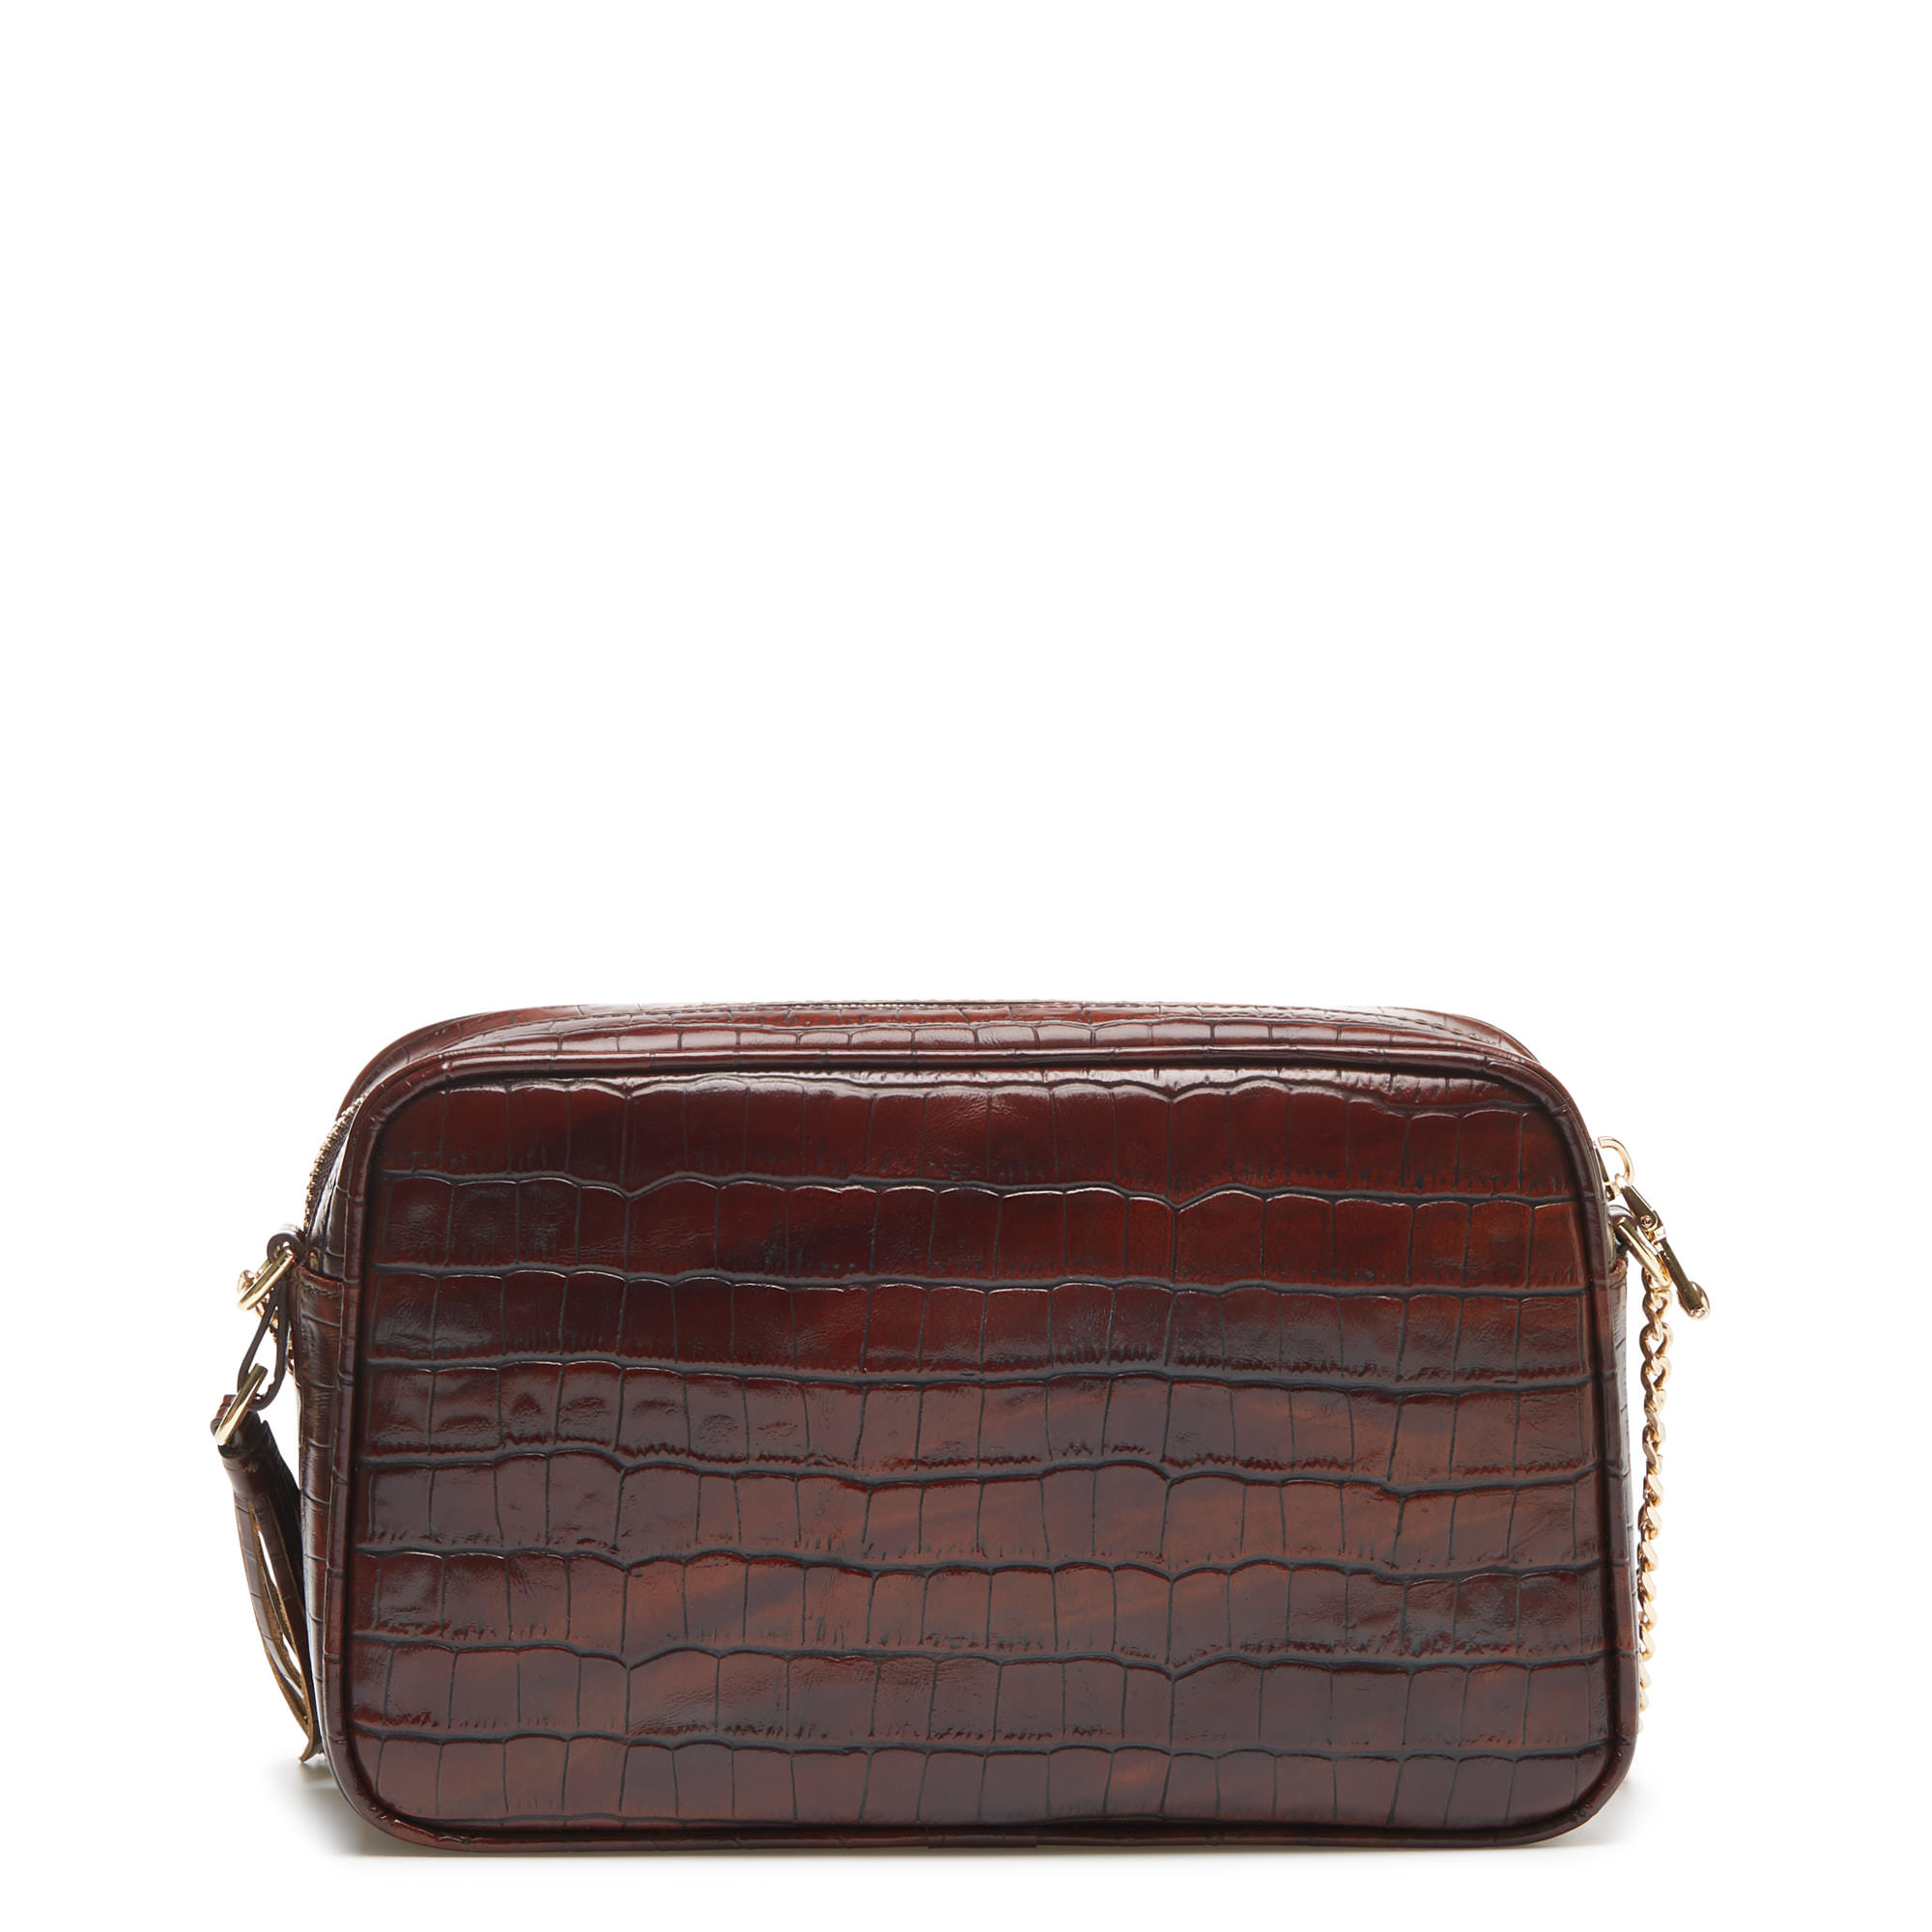 Isabel Bernard Honoré Lucie croco brown calfskin leather crossbody bag